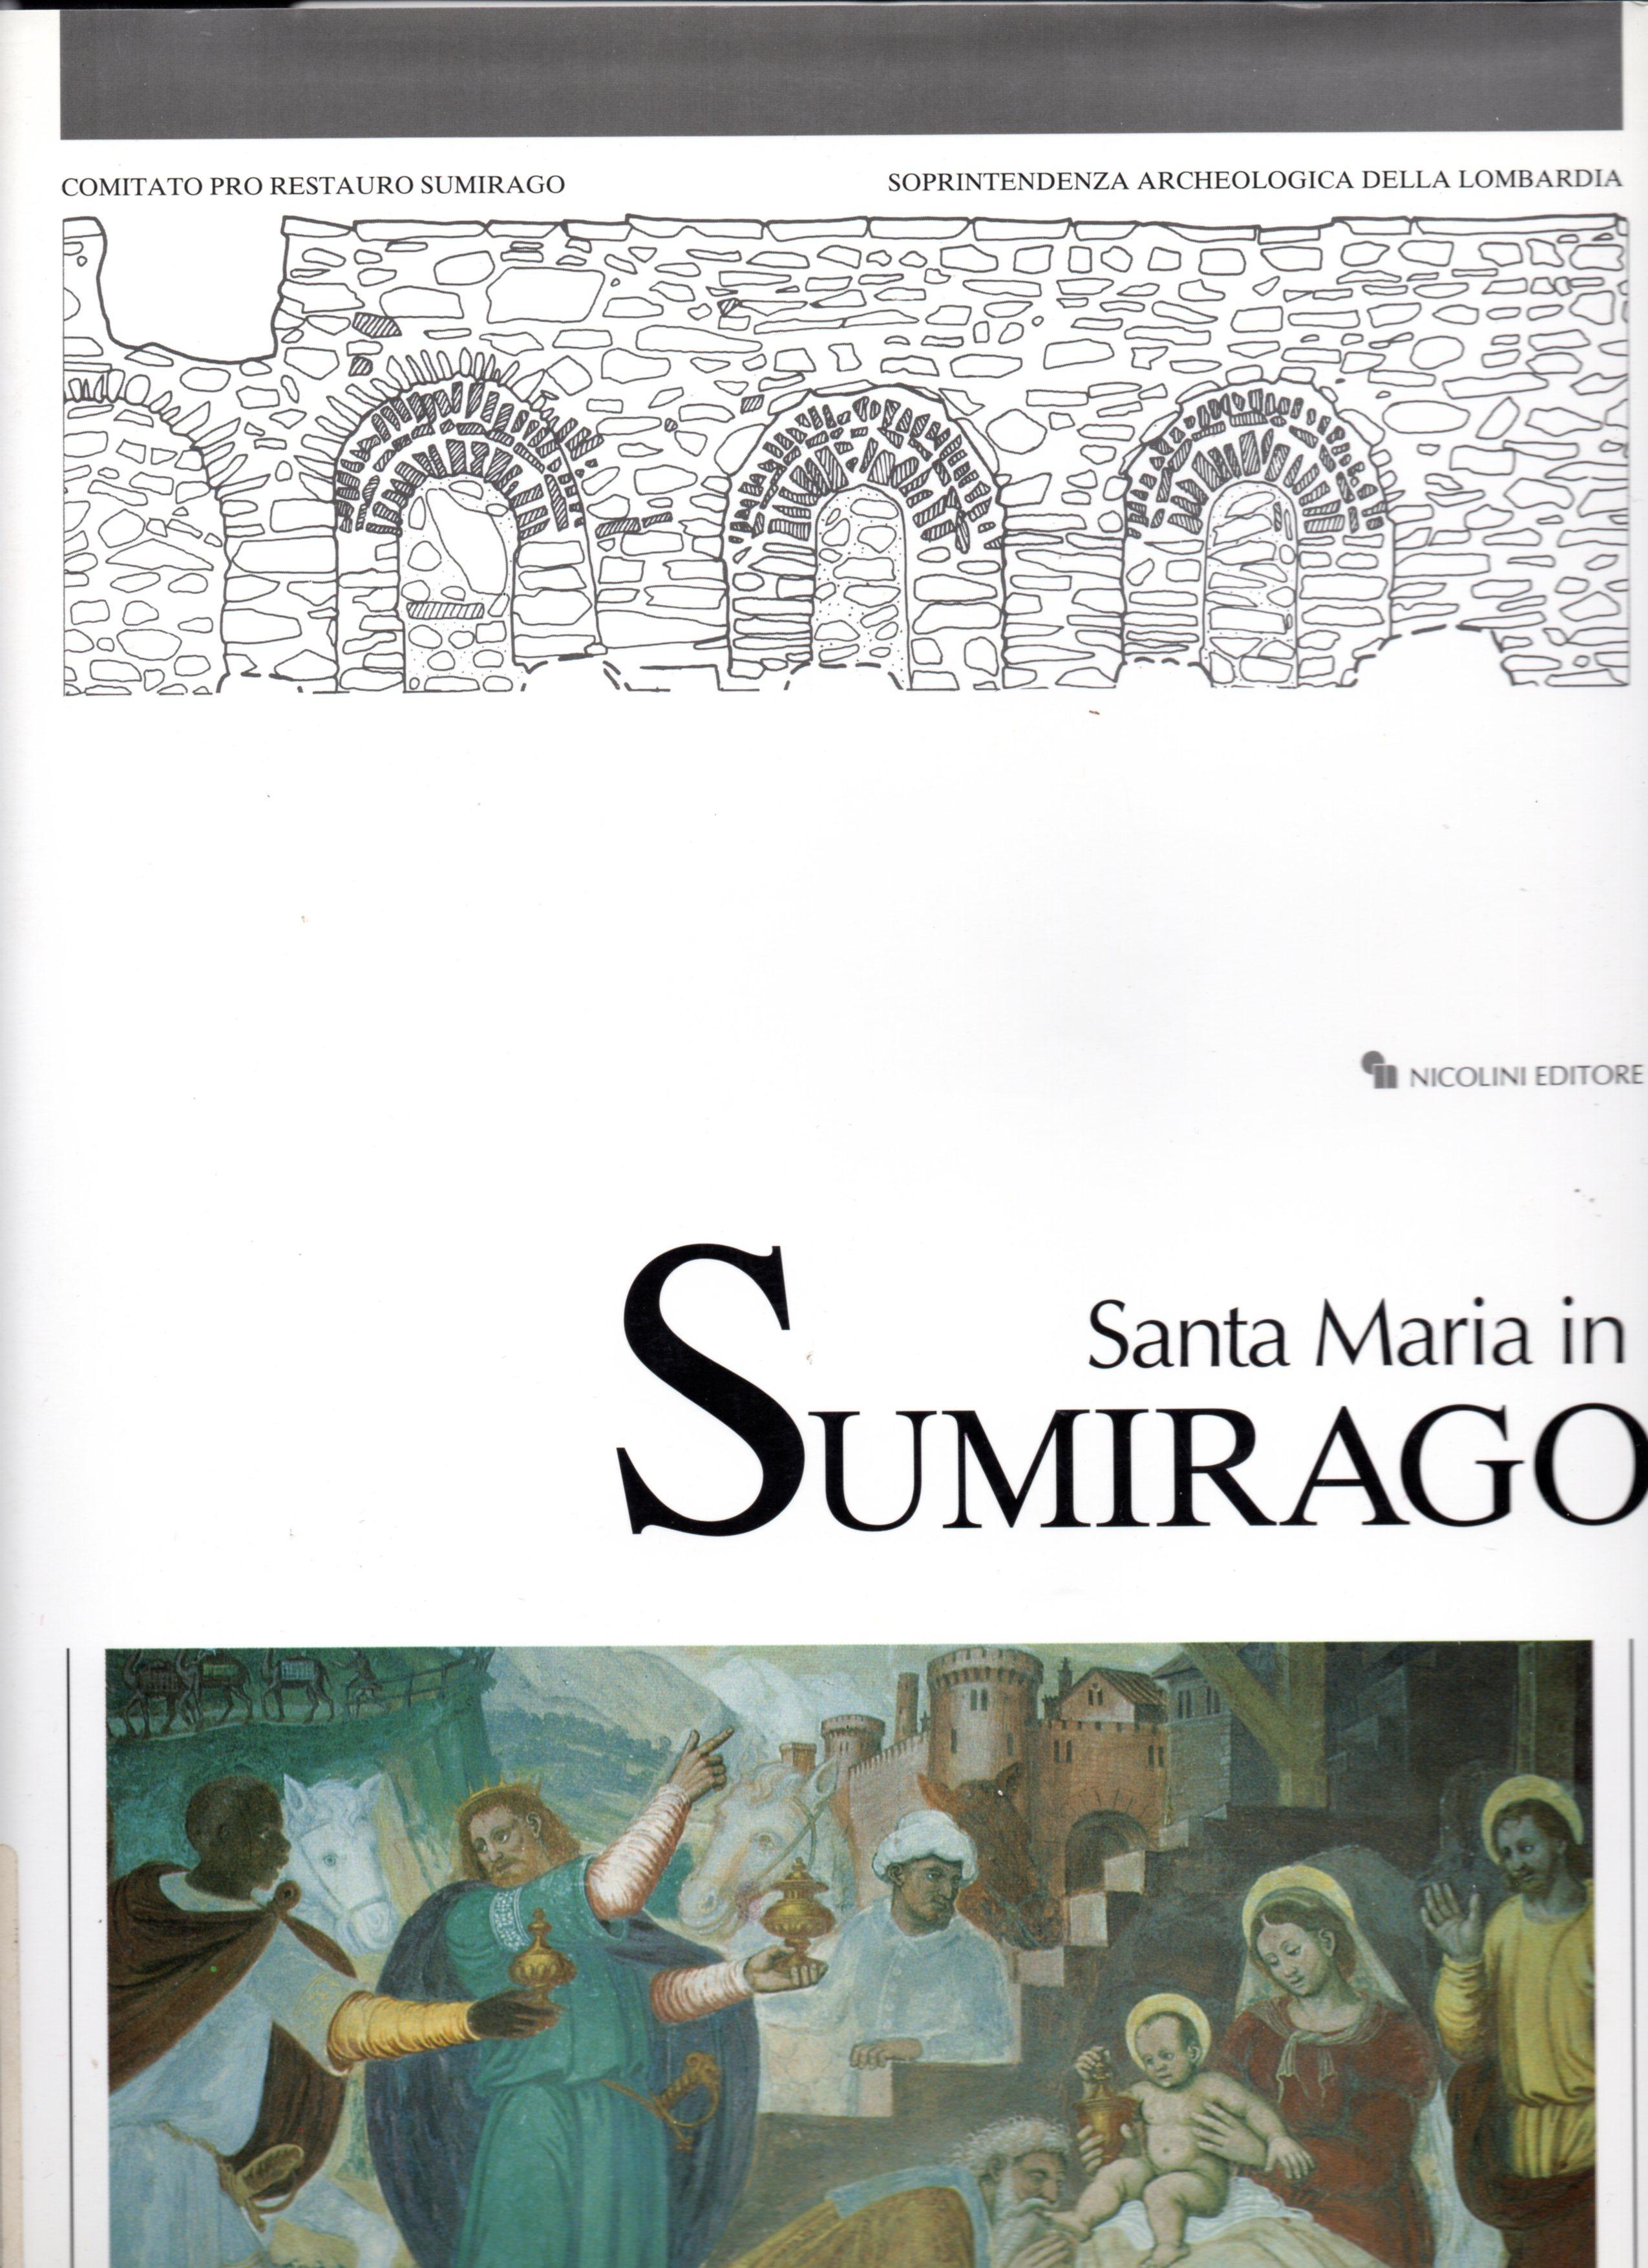 Santa Maria in Sumirago